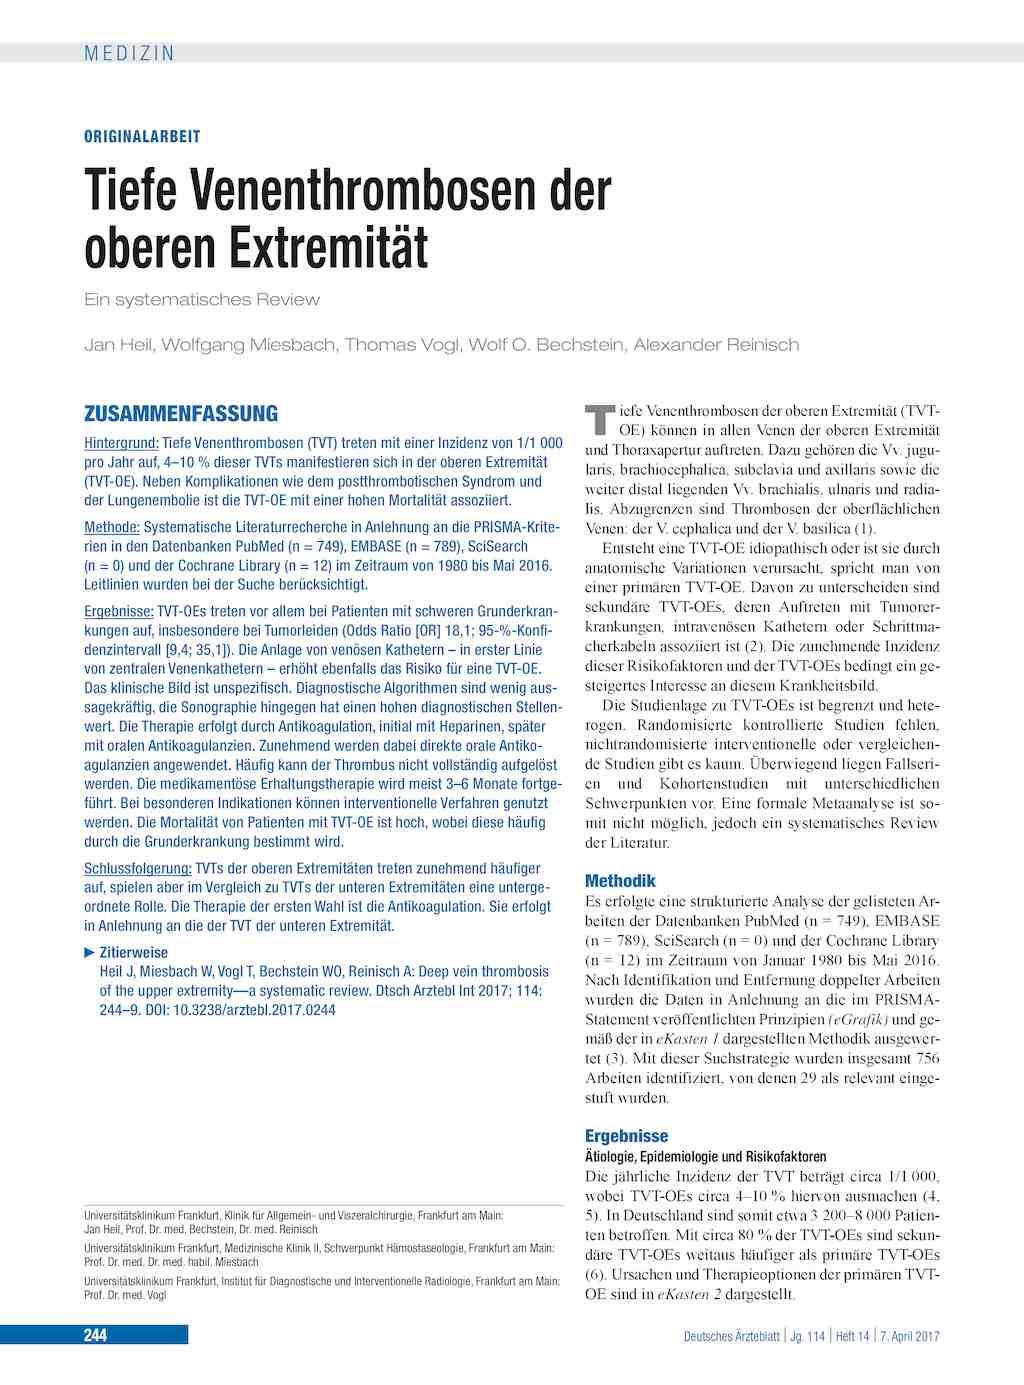 Tiefe Venenthrombosen der oberen Extremität